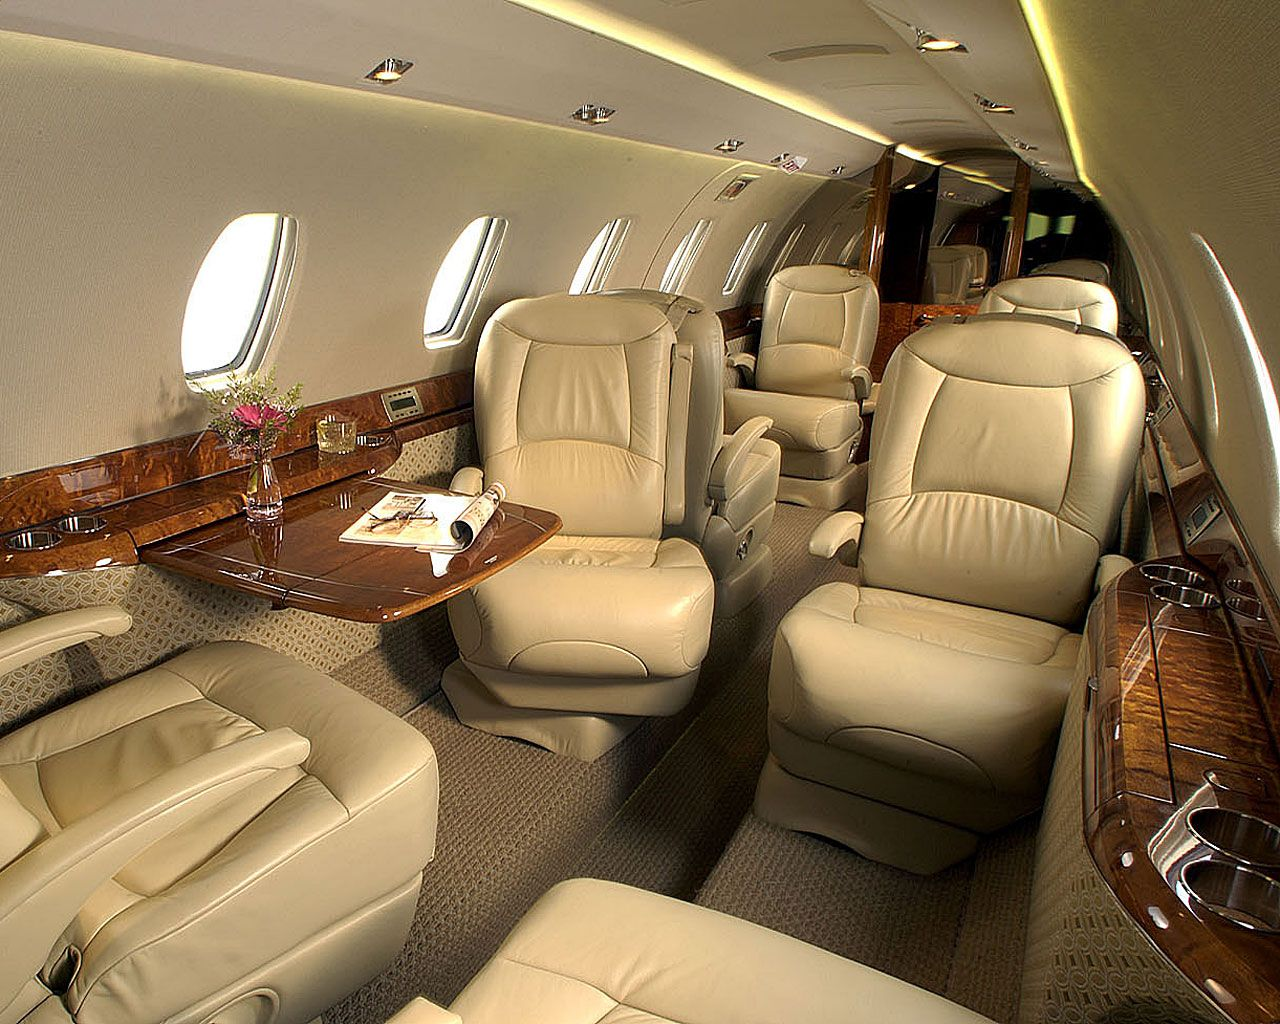 Gulfstream g650 interior bedroom citation x cabin  dreams  pinterest  private plane planes and